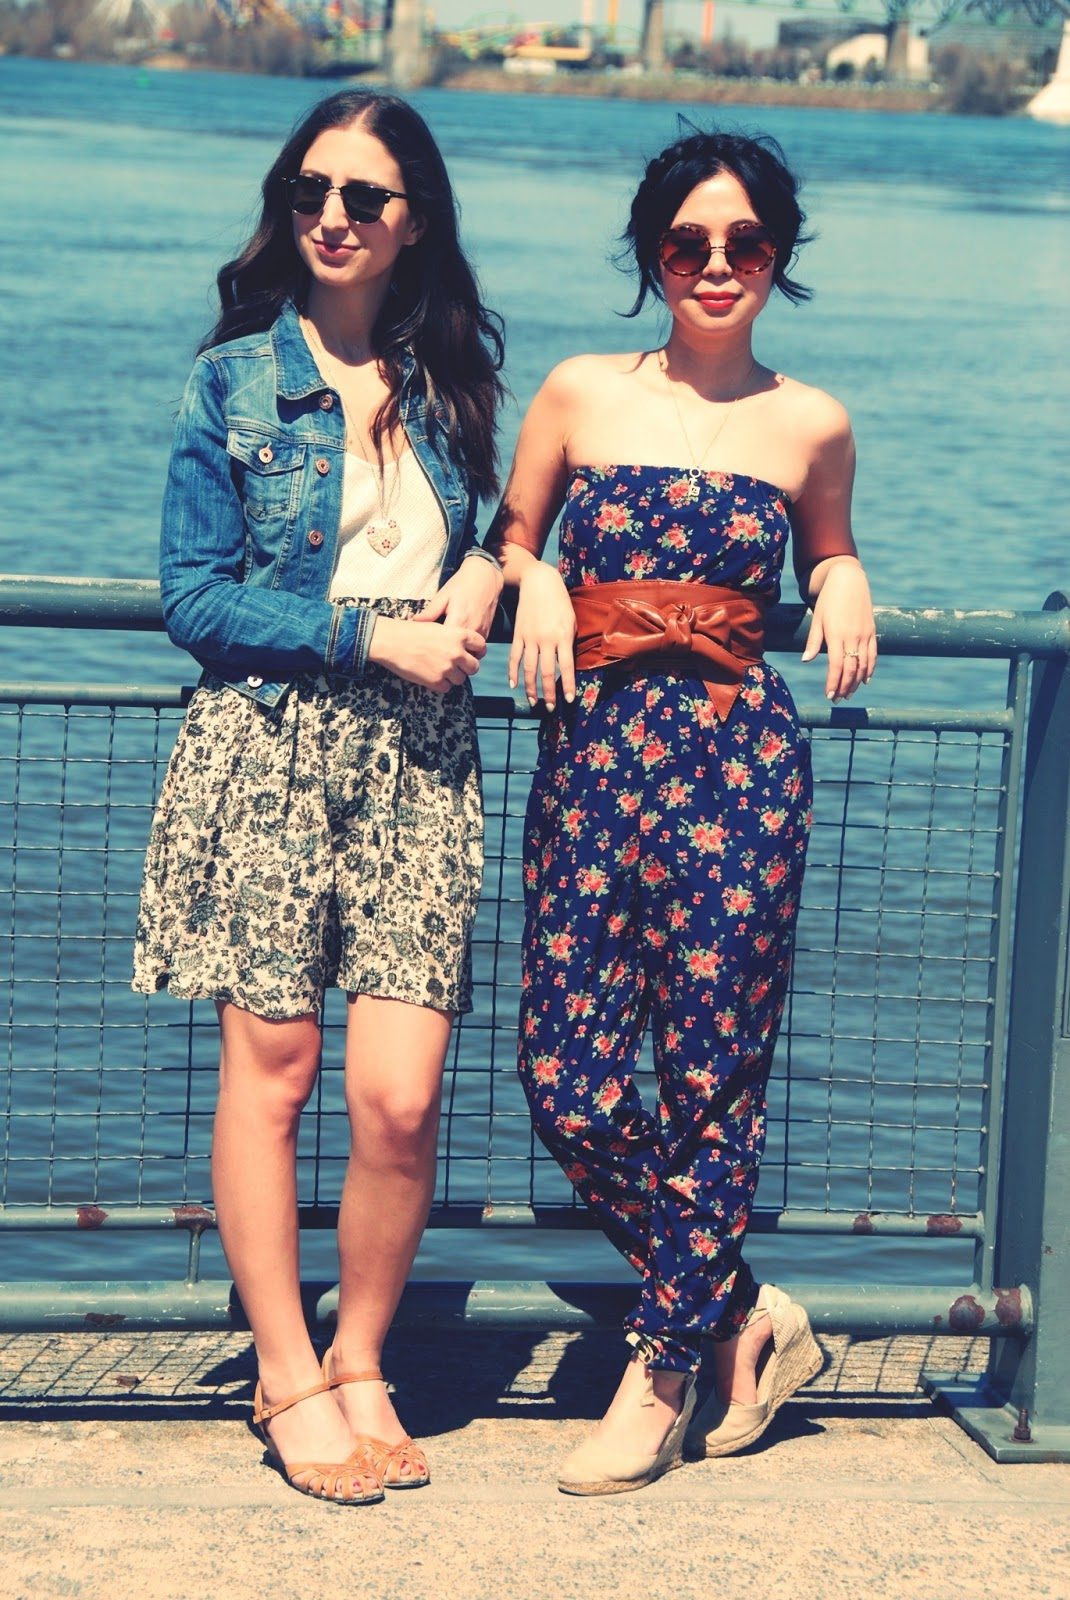 floral jumpsuit romper espadrilles round sunglasses beige sandals skirt jean jacket raybans